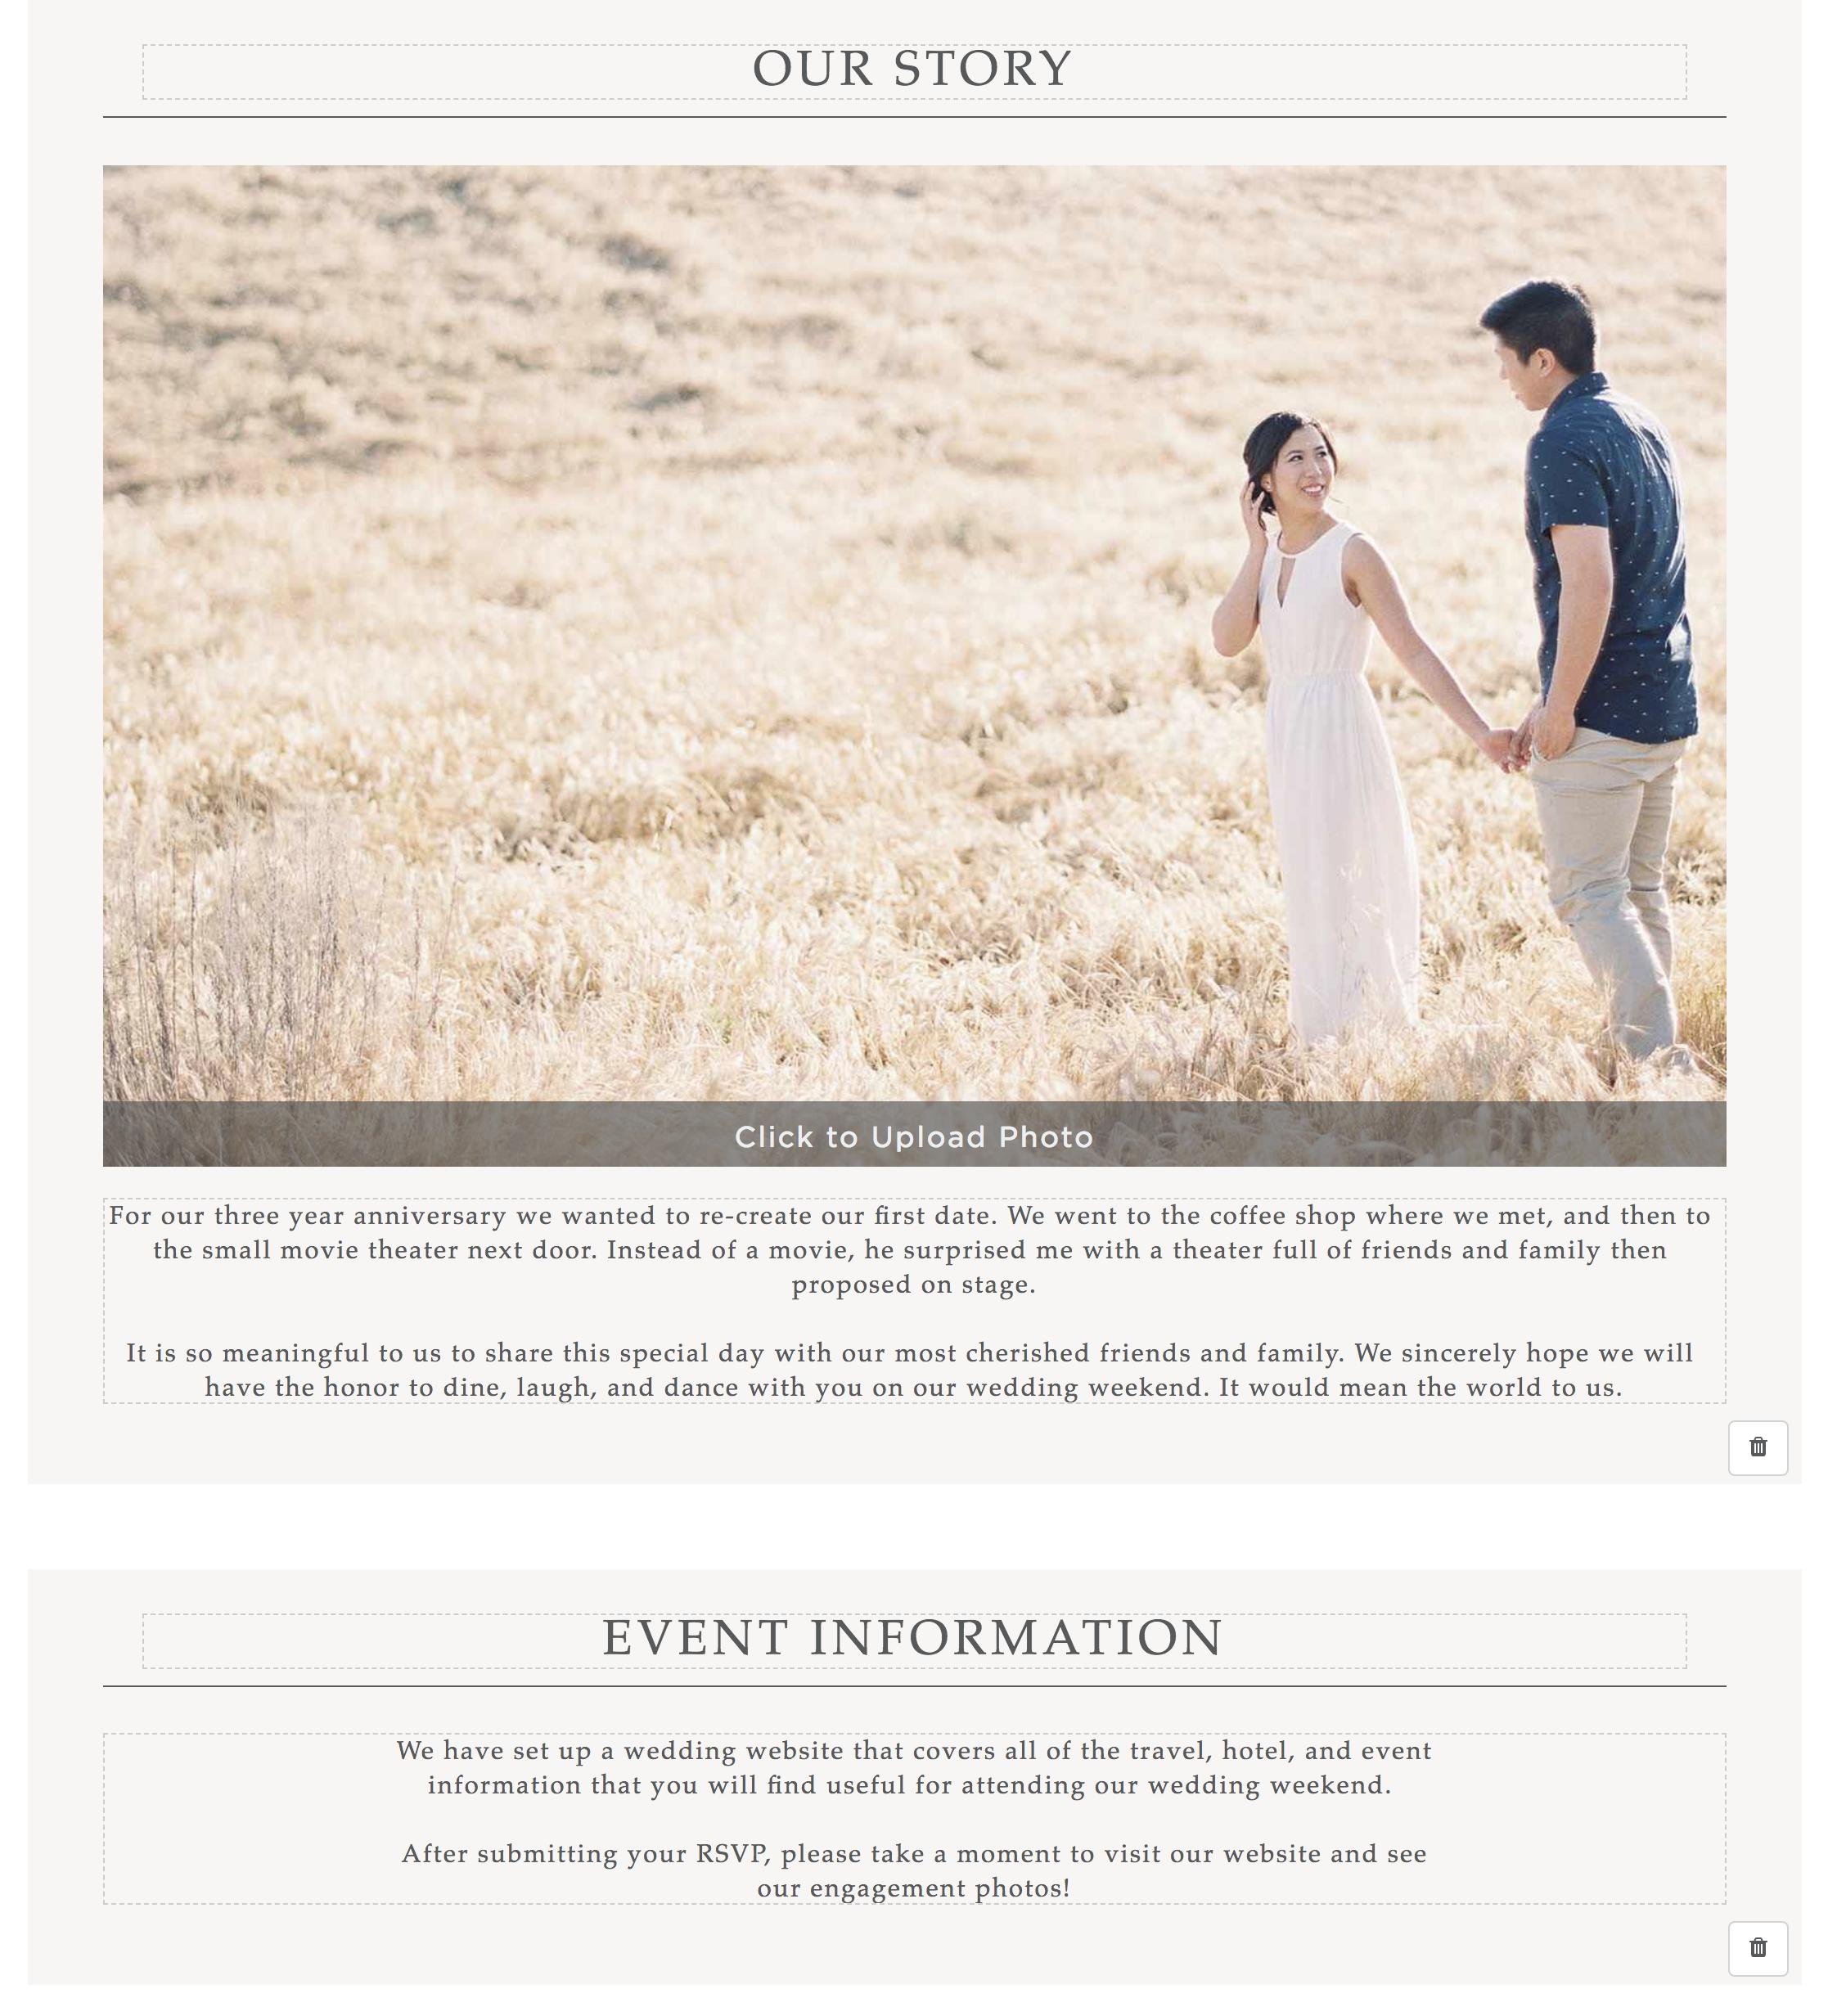 basic invite wedding website sample 3.png